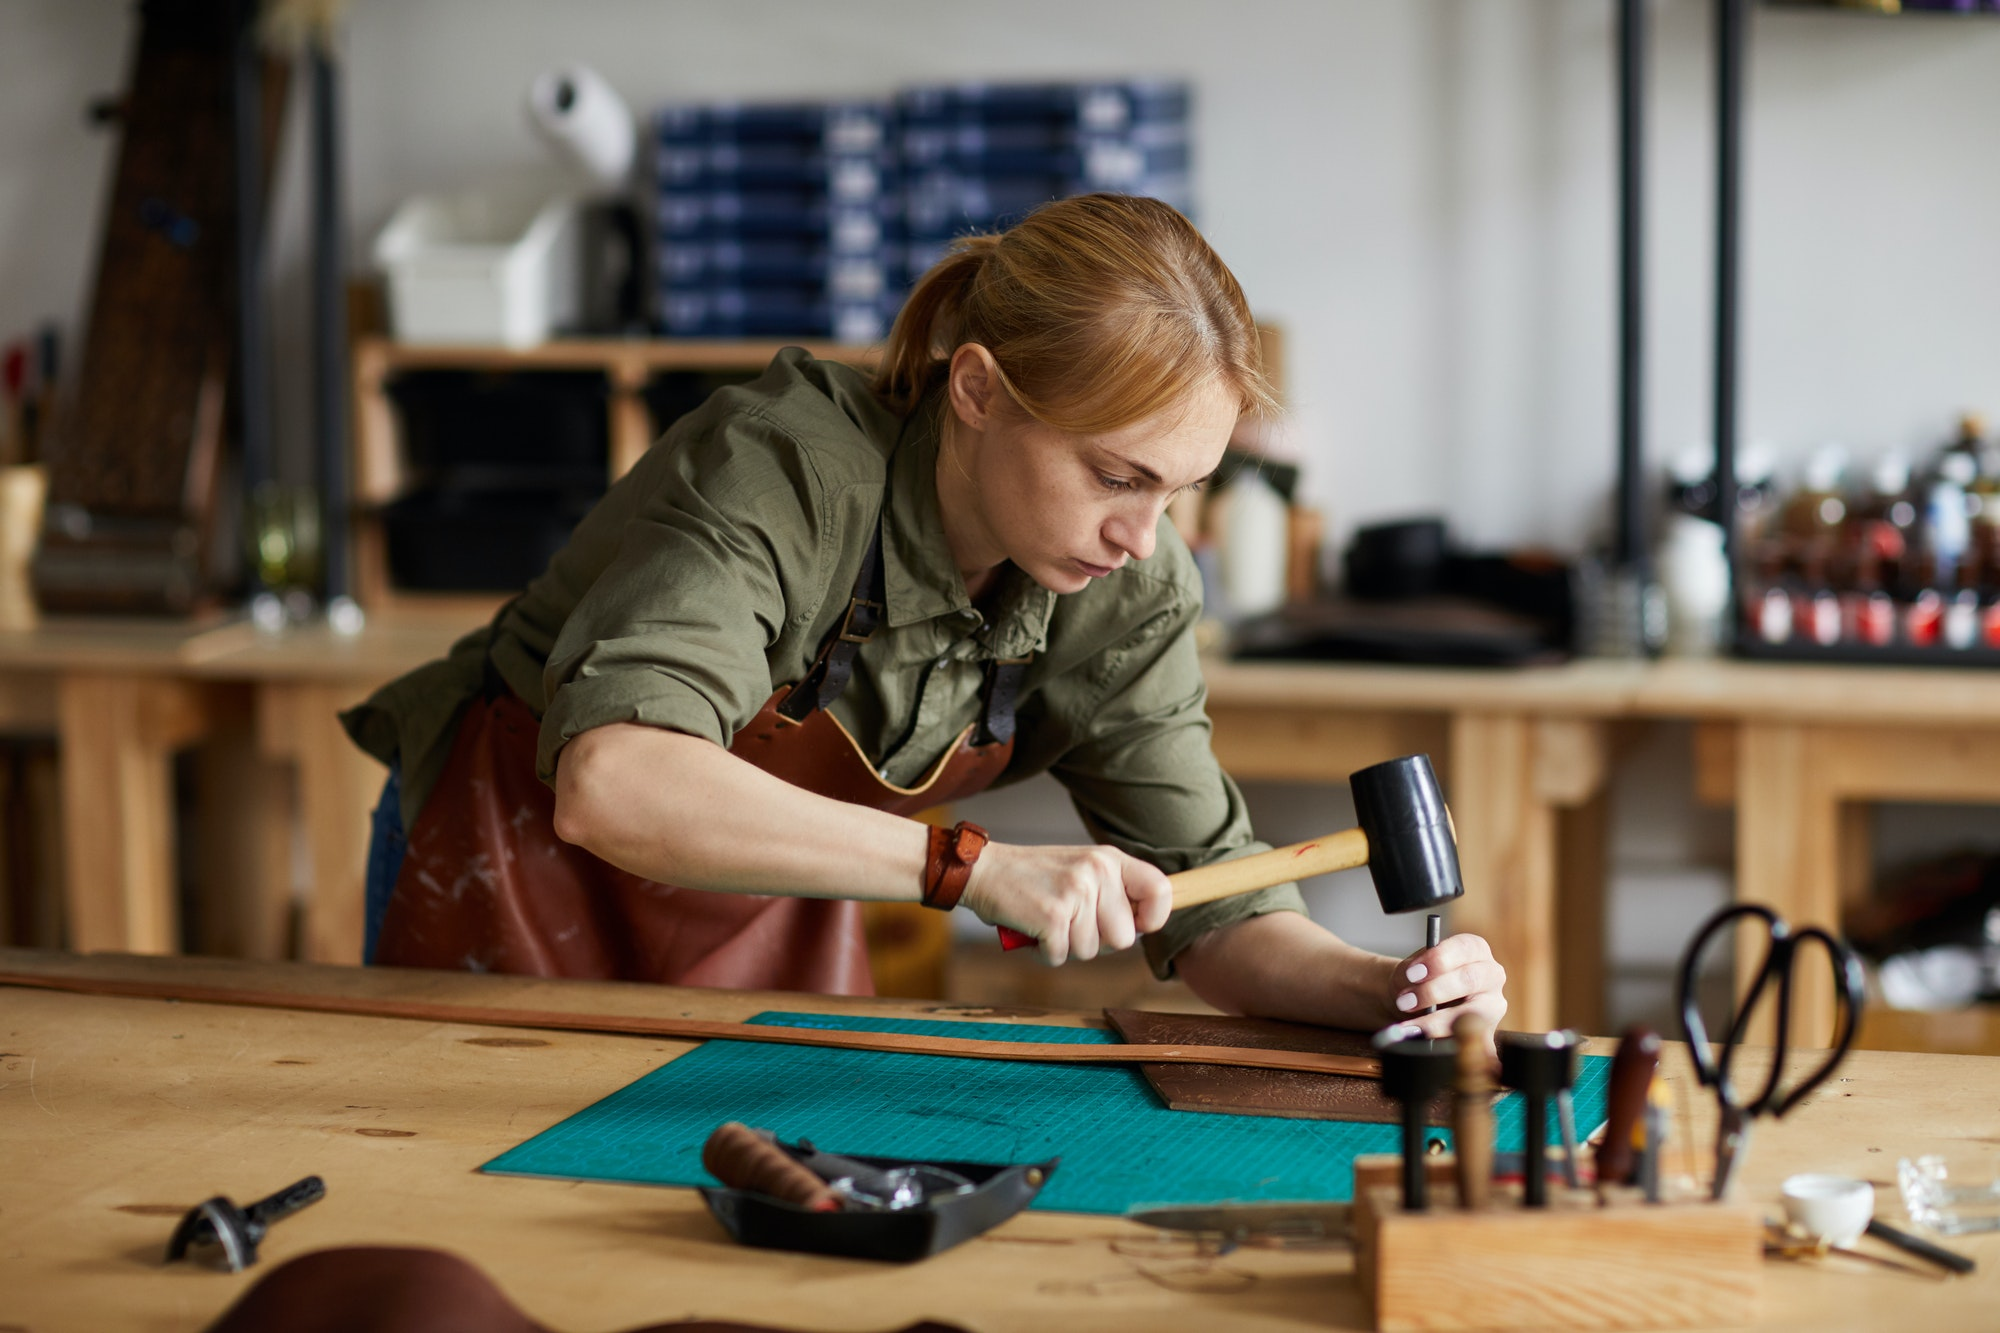 Female craftsman working in shop